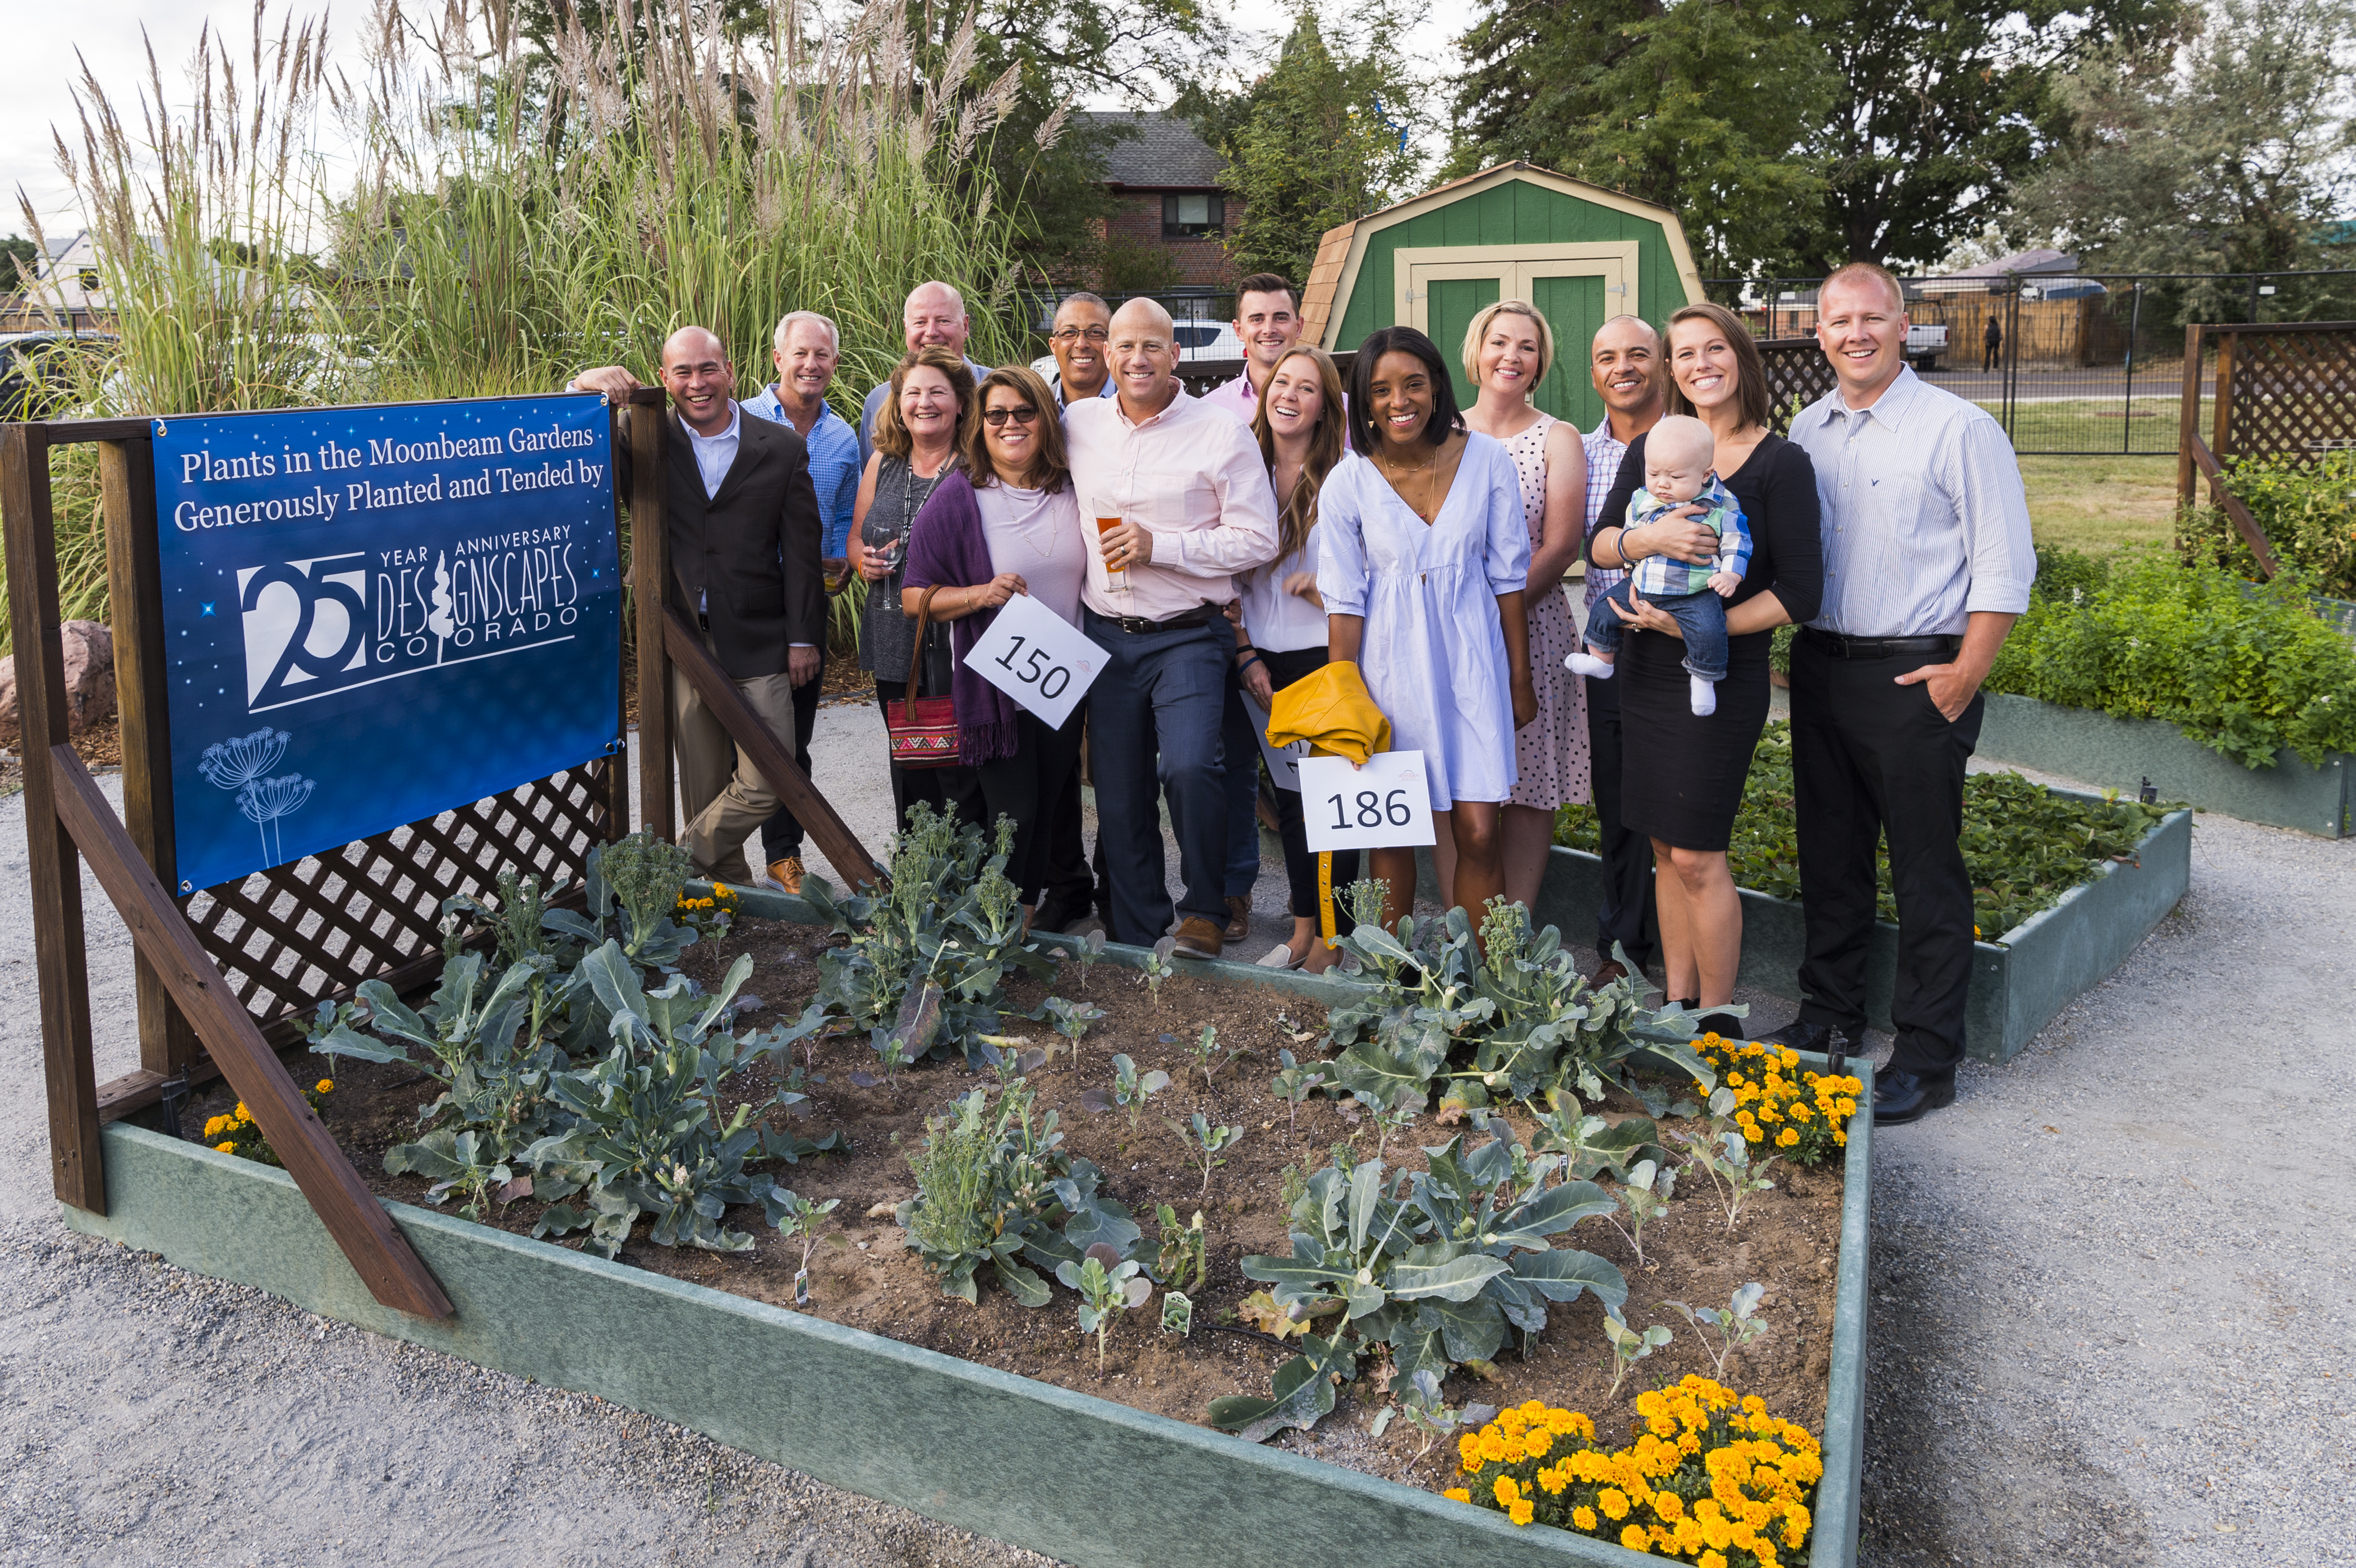 Moonbeam Garden sponsors, Designscapes Colorado